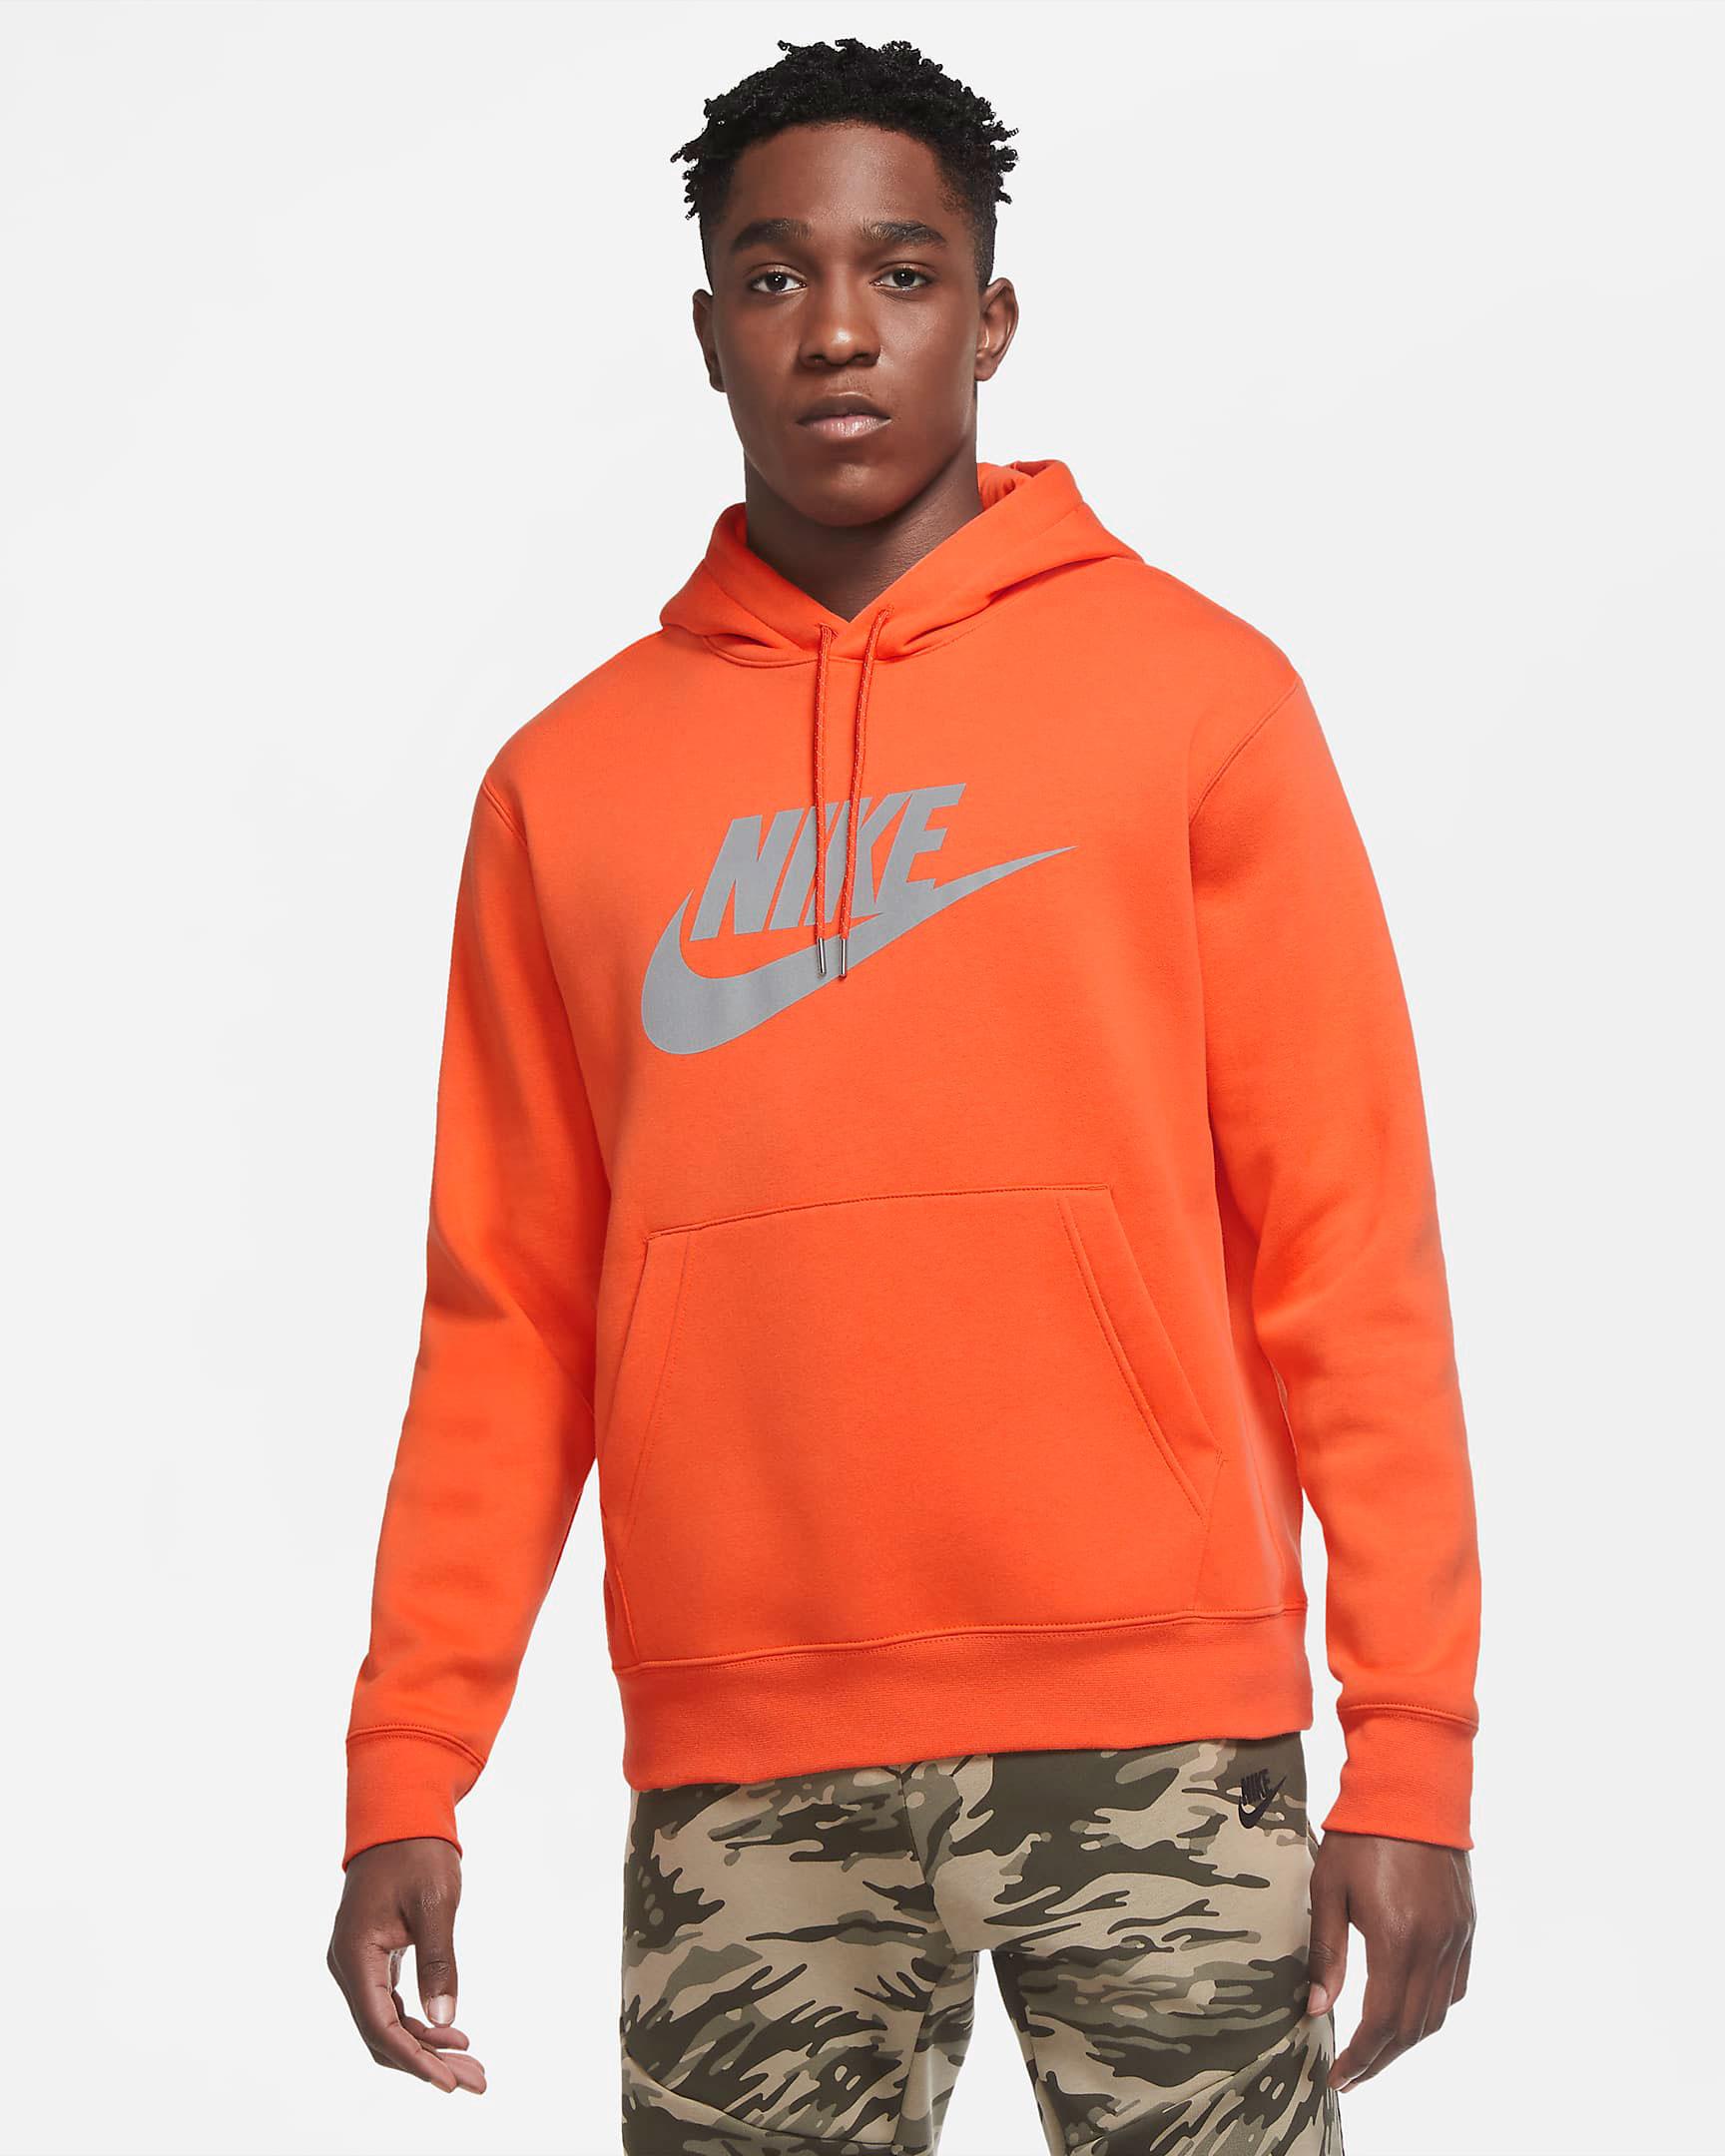 nike-foamposite-halloween-hoodie-orange-silver